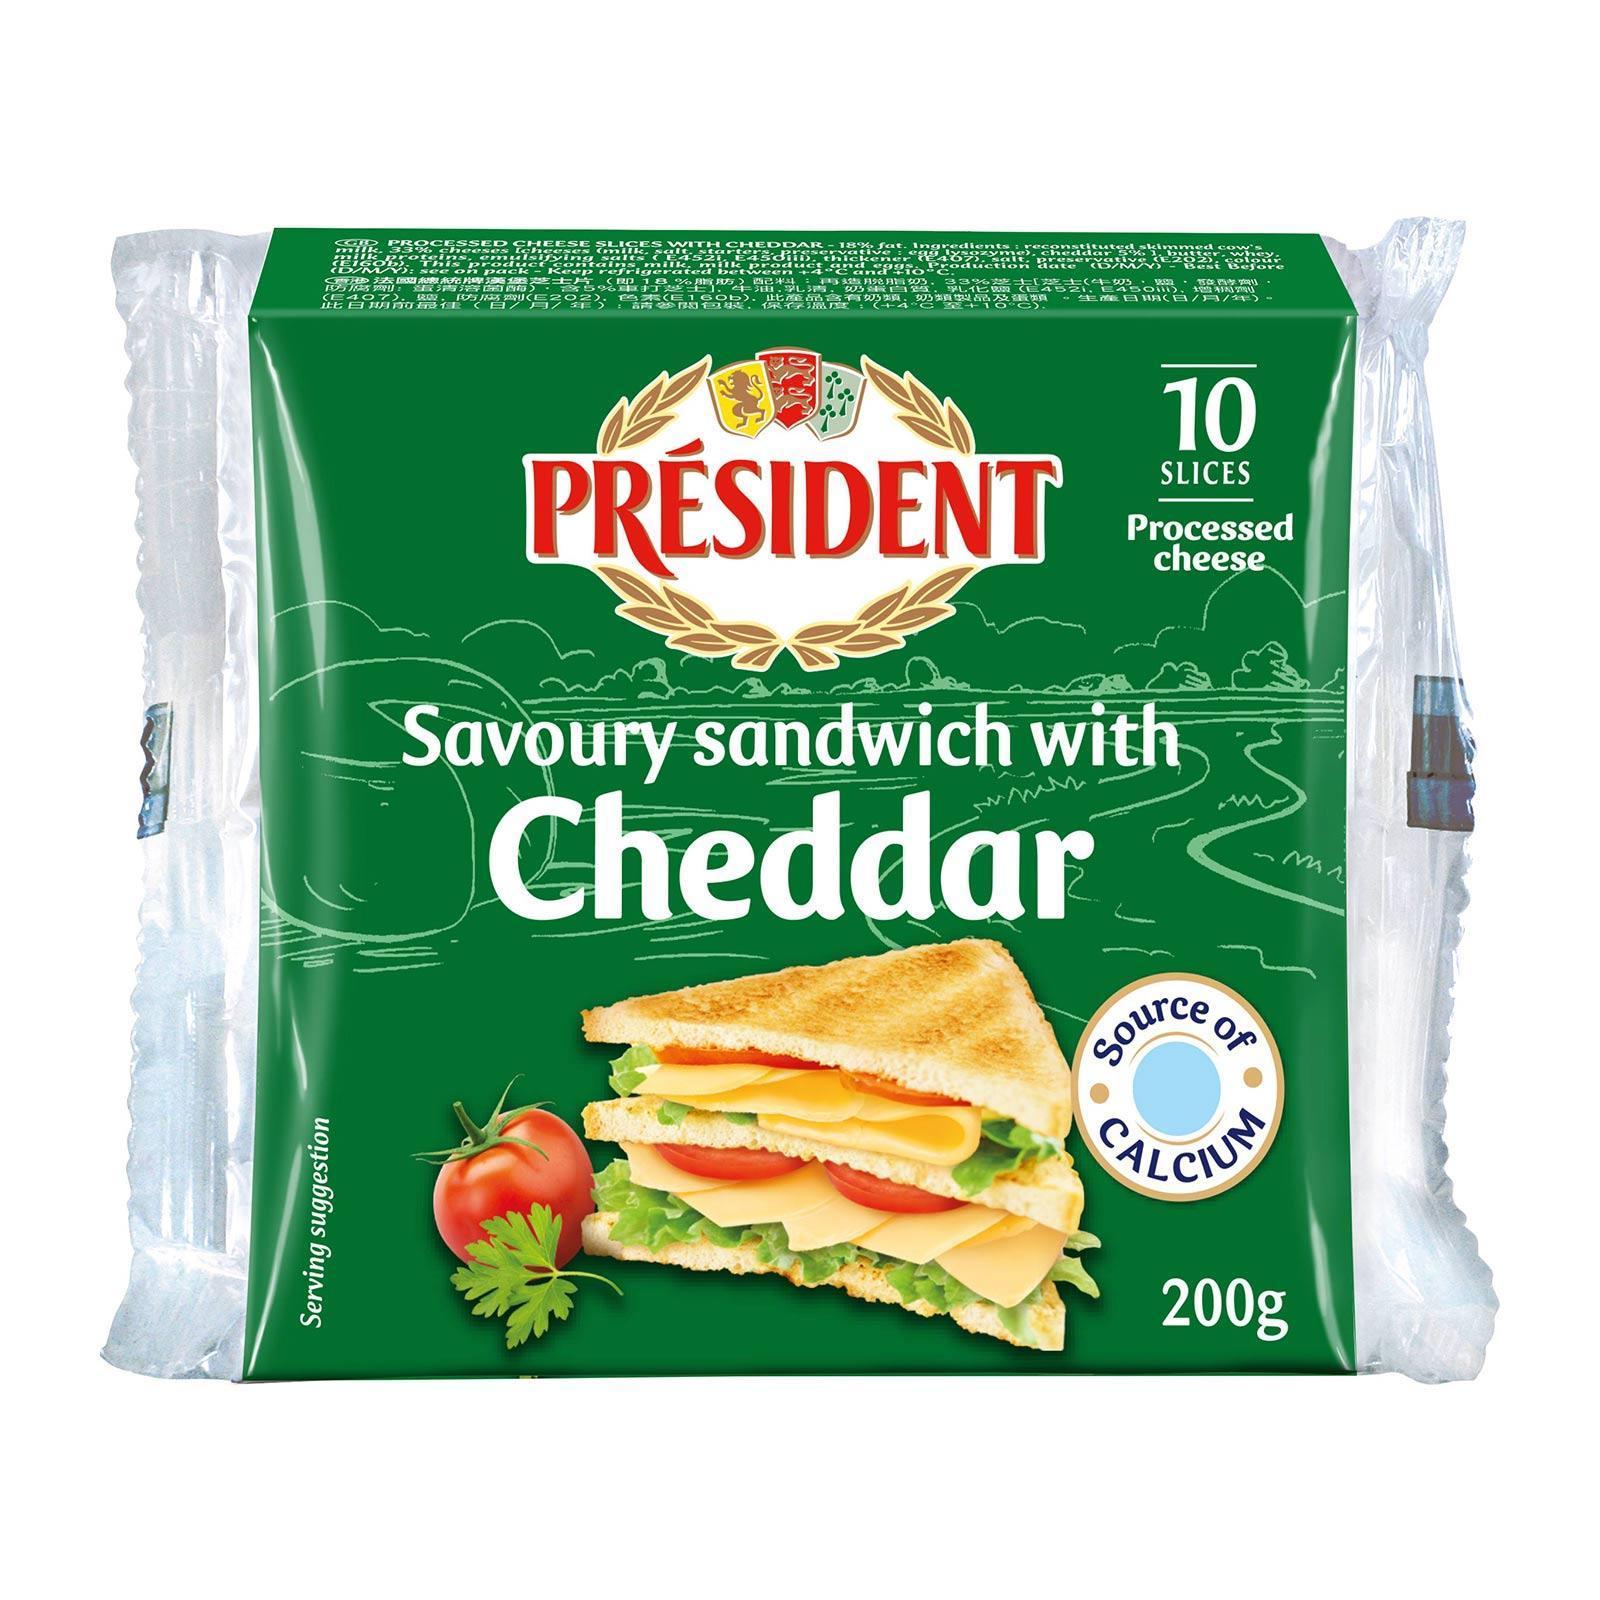 President Sandwich Cheddar Cheese Slices